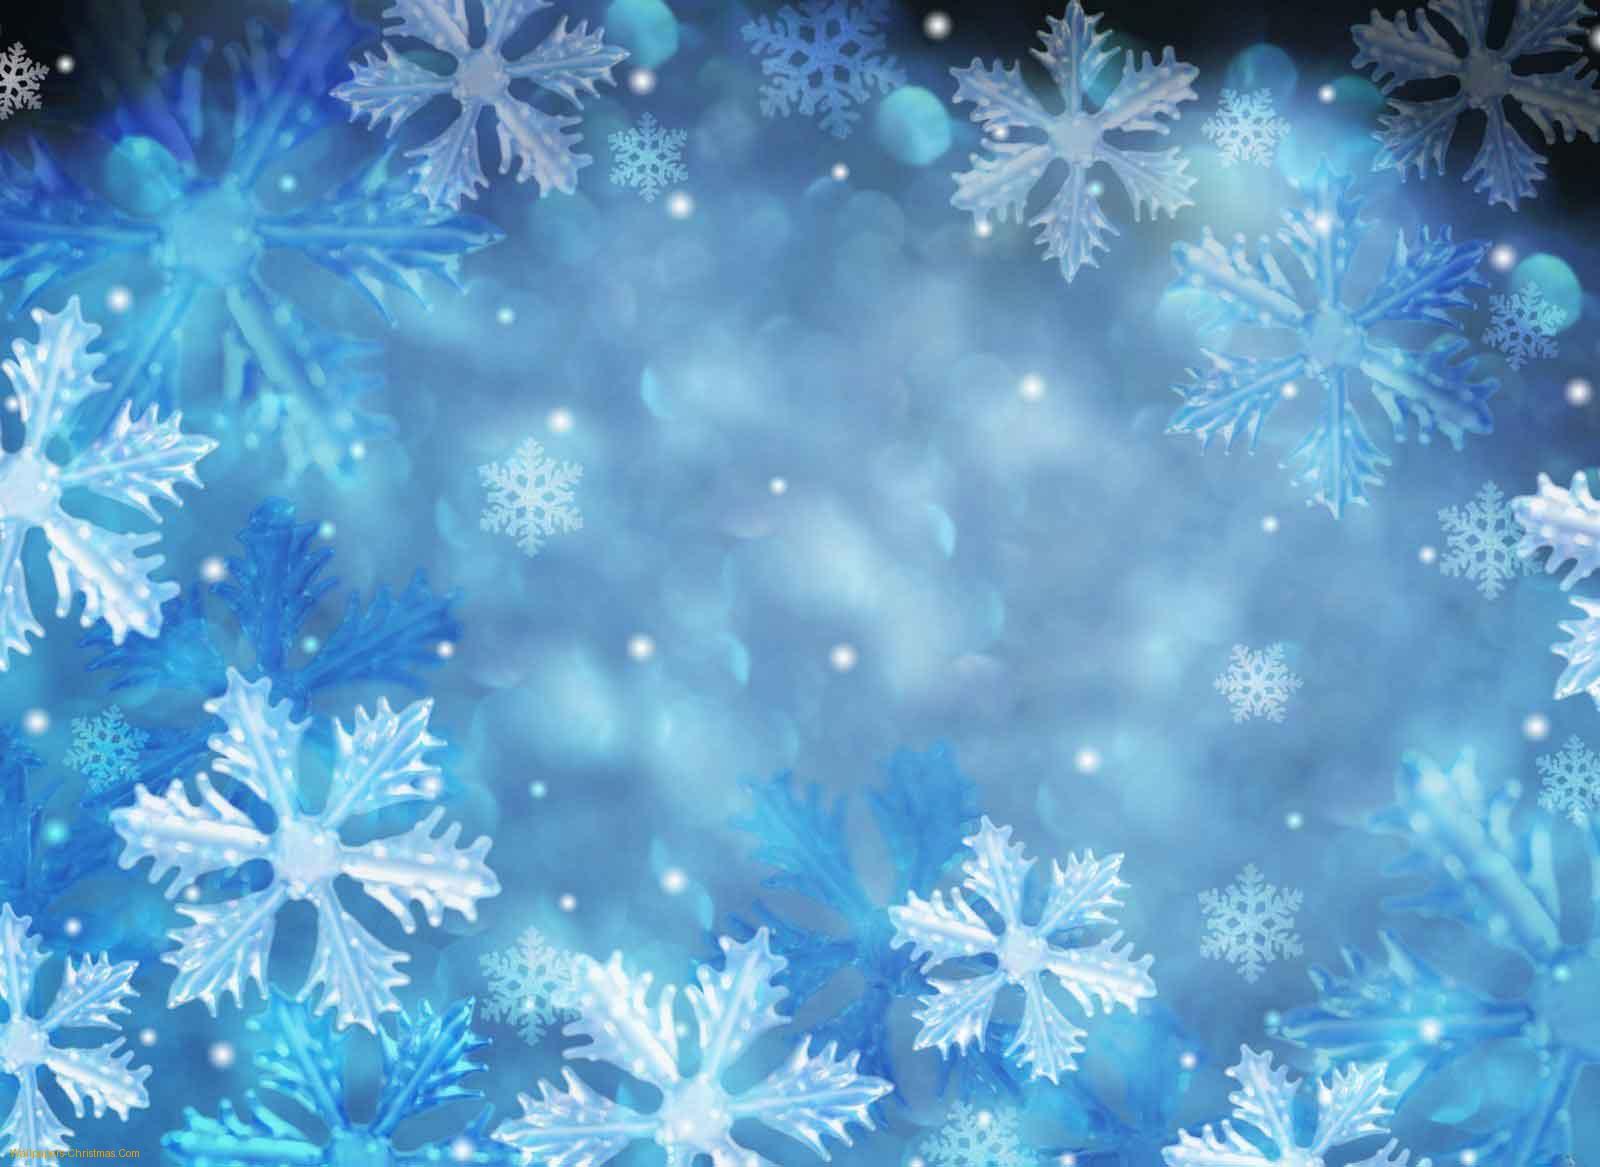 Christmas Snow Wallpapers 1600x1167 Download Hd Wallpaper Wallpapertip